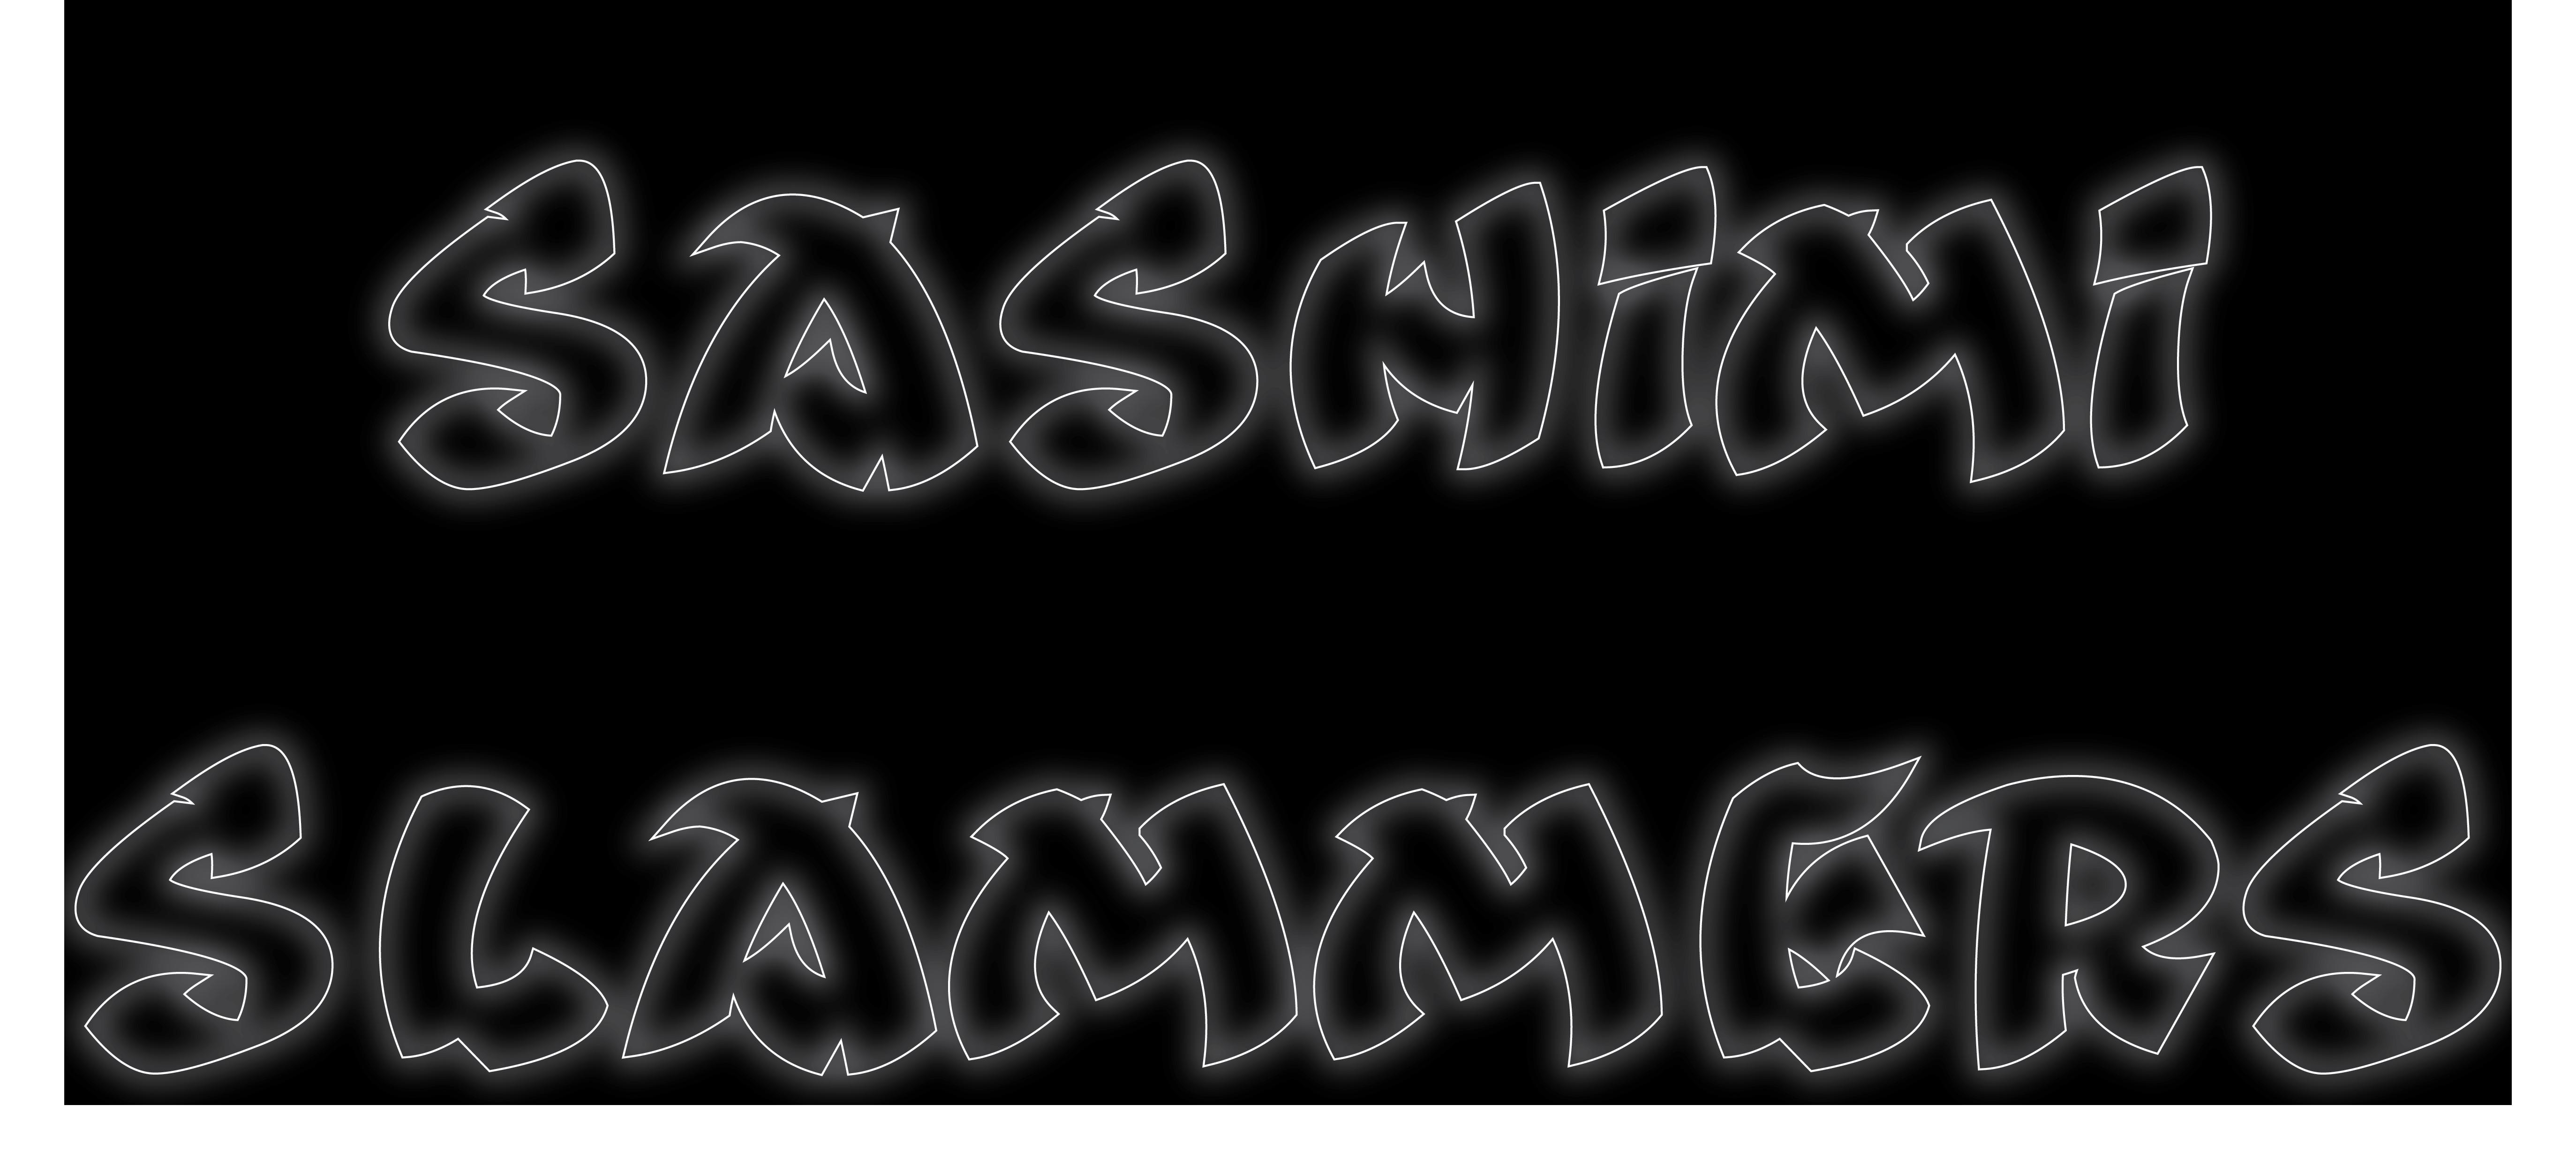 Sashimi Slammers